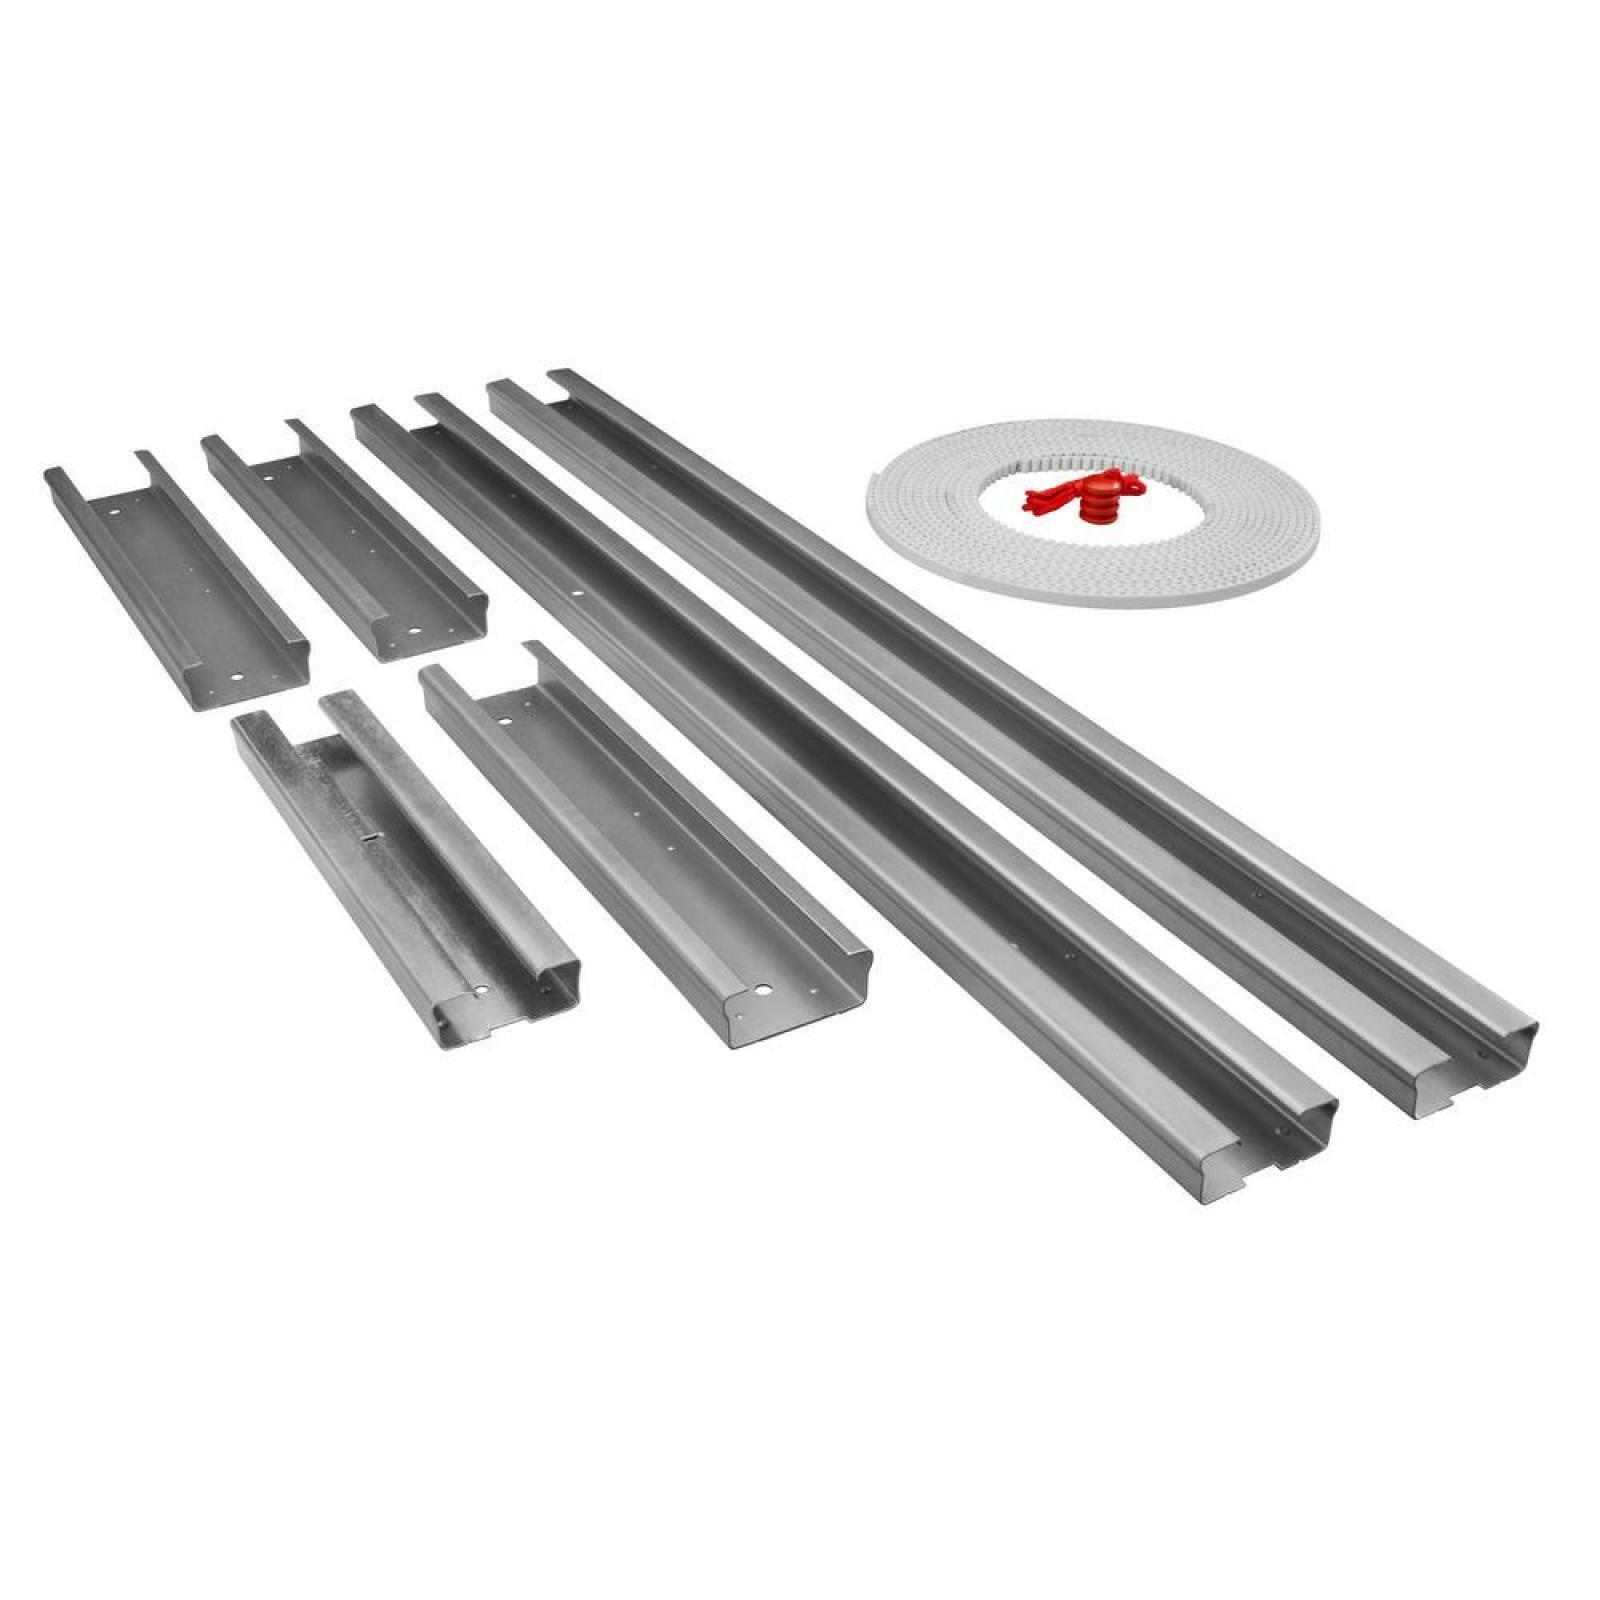 Ryobi Garage Door Opener Rail Belt Drive Extension Kit 14 Manual Guide